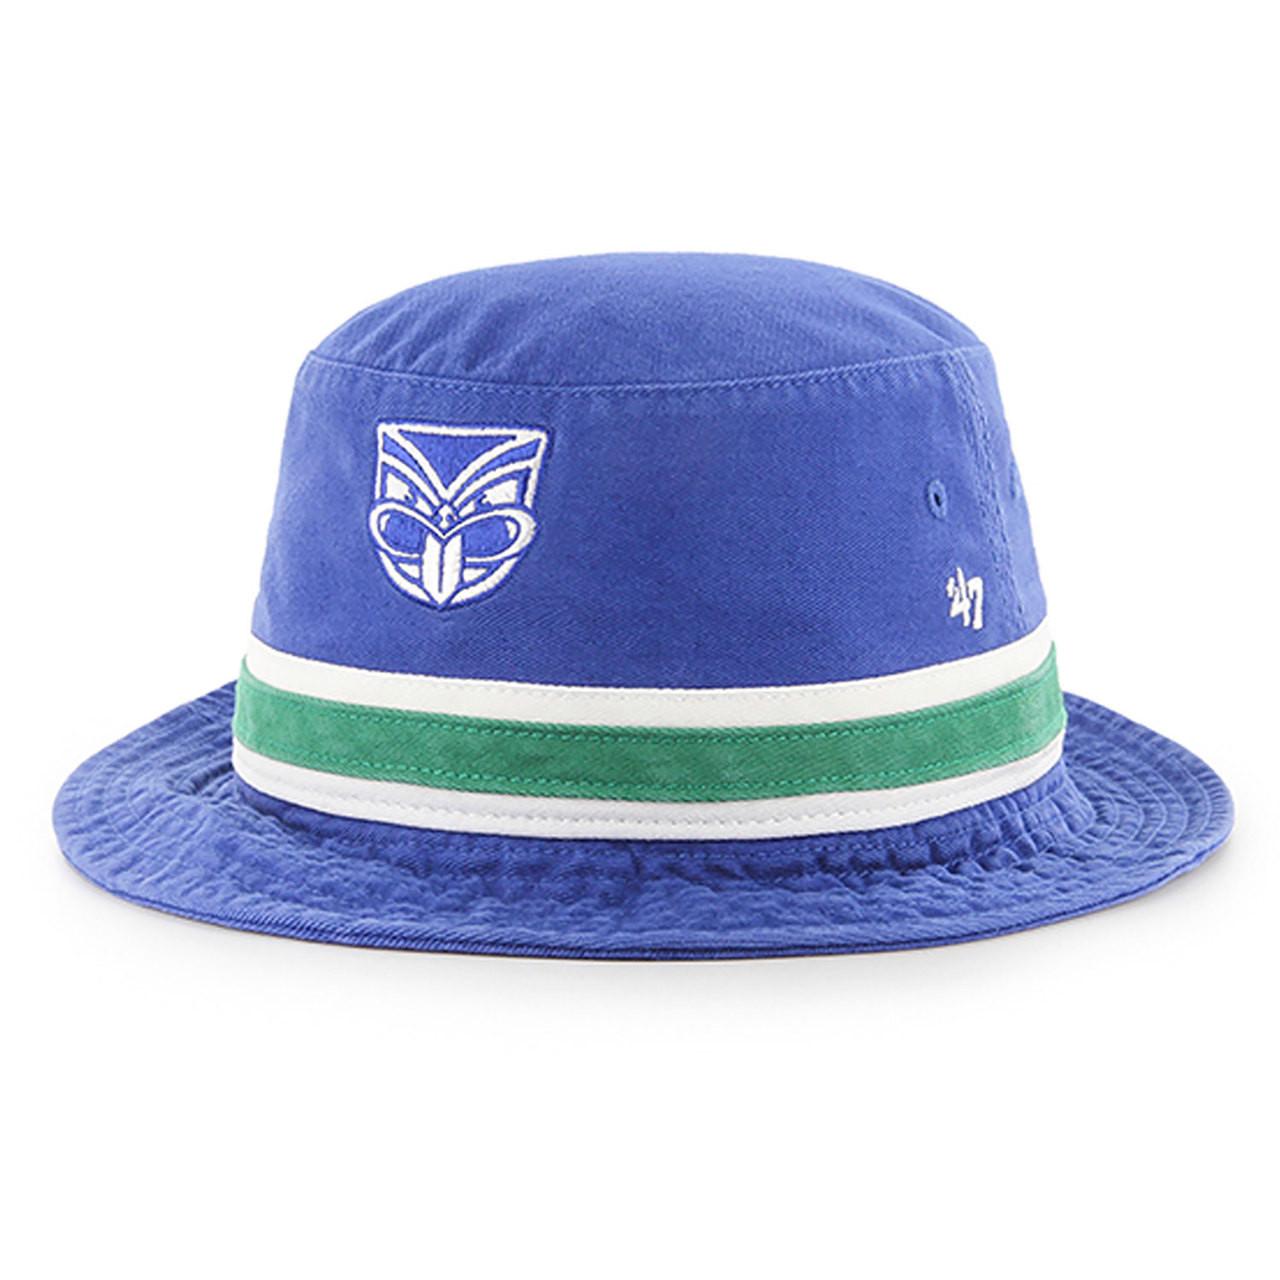 2019 Warriors 47 Brand Striped Bucket Hat - Warriors Superstore 85aac85b1fee